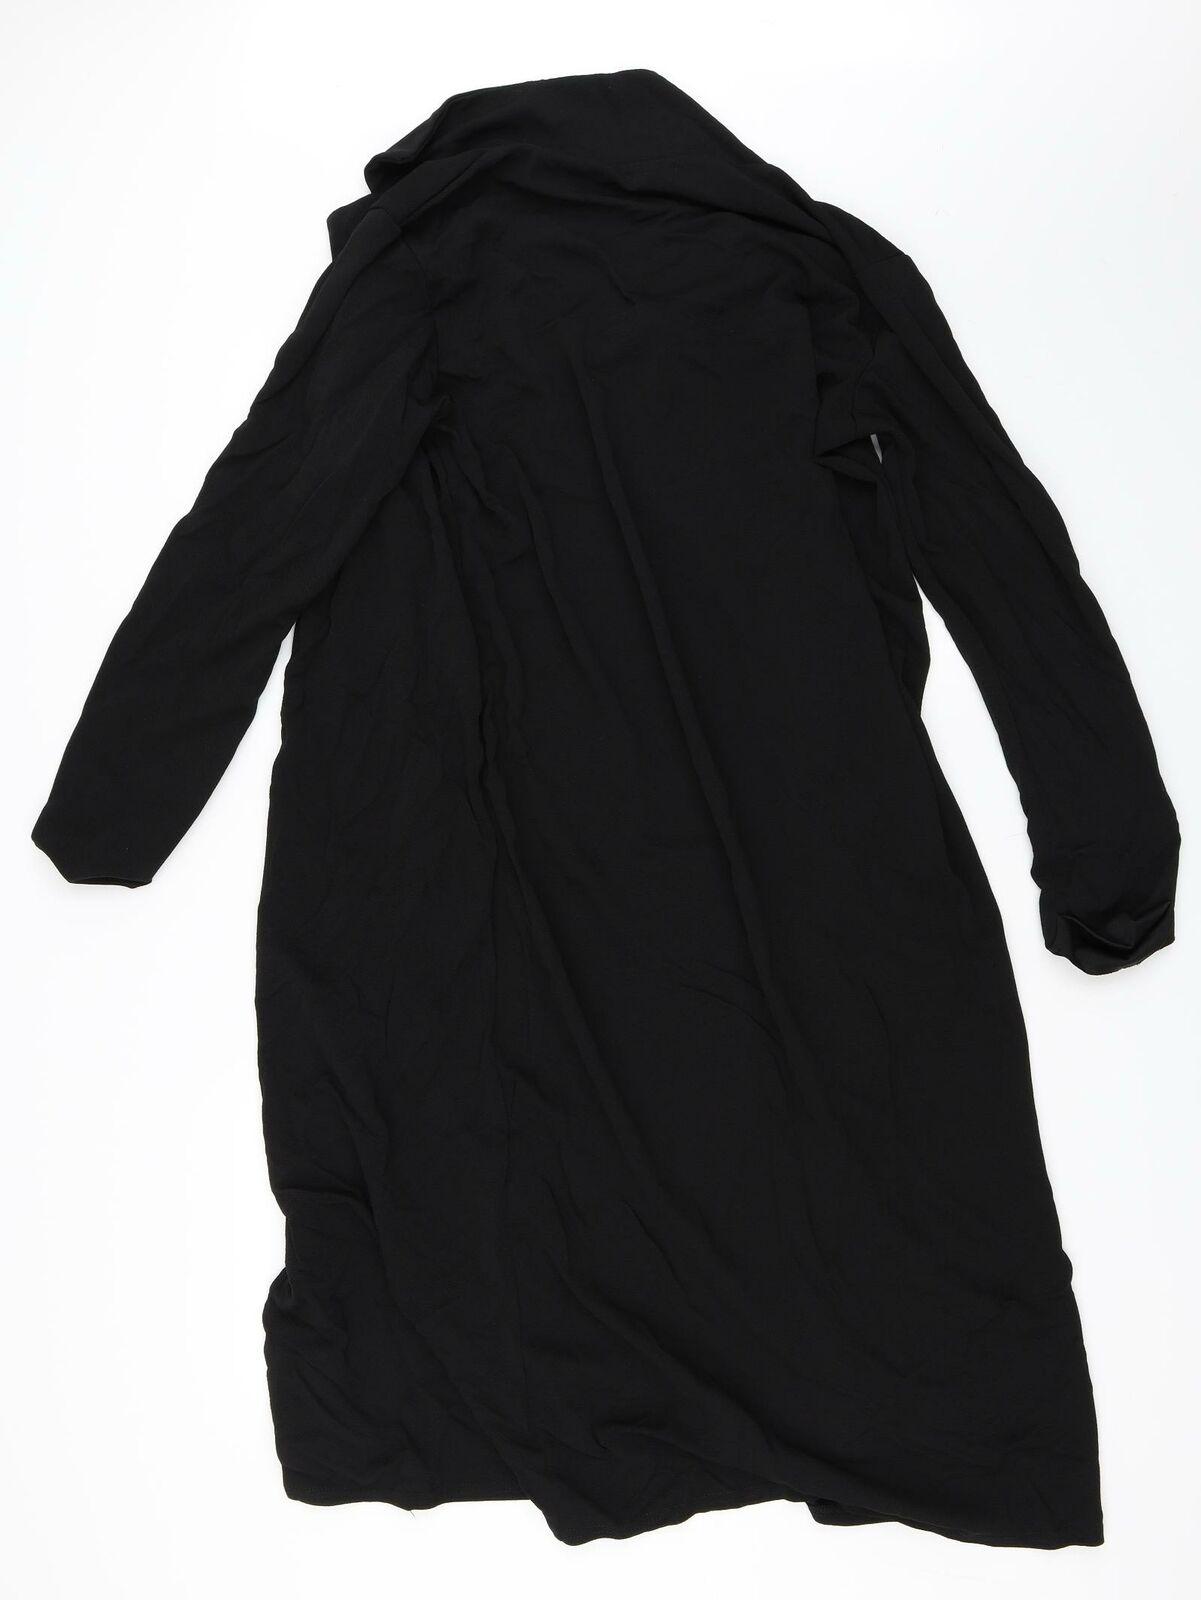 Boohoo Womens Black Jacket Size 18